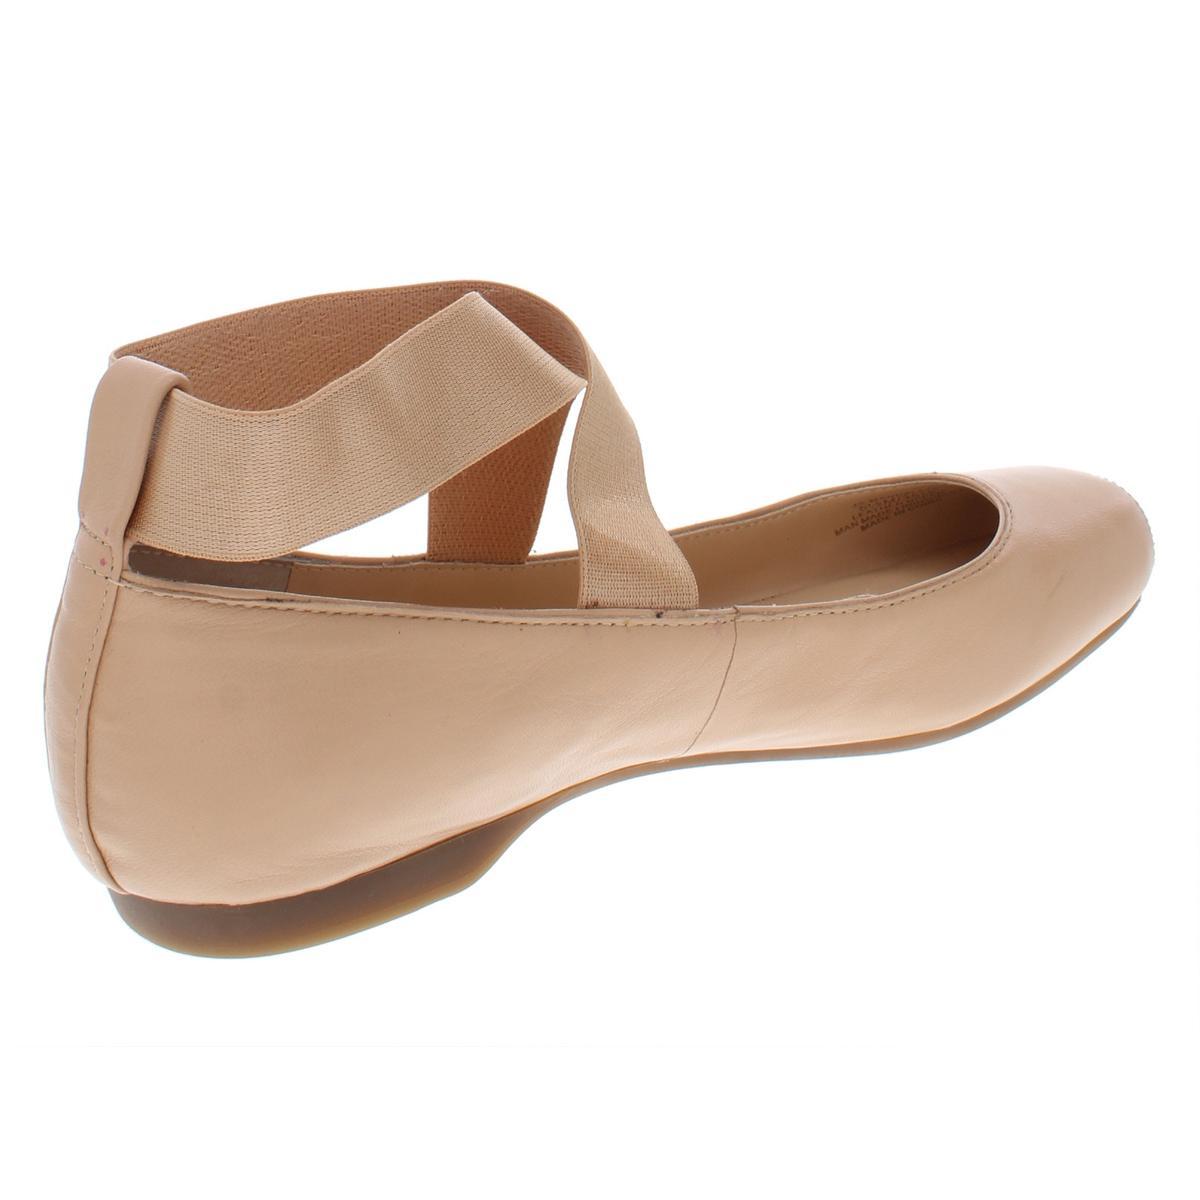 Jessica-Simpson-Women-039-s-Mandalaye-Square-Toe-Ankle-Wrap-Ballet-Flats thumbnail 14